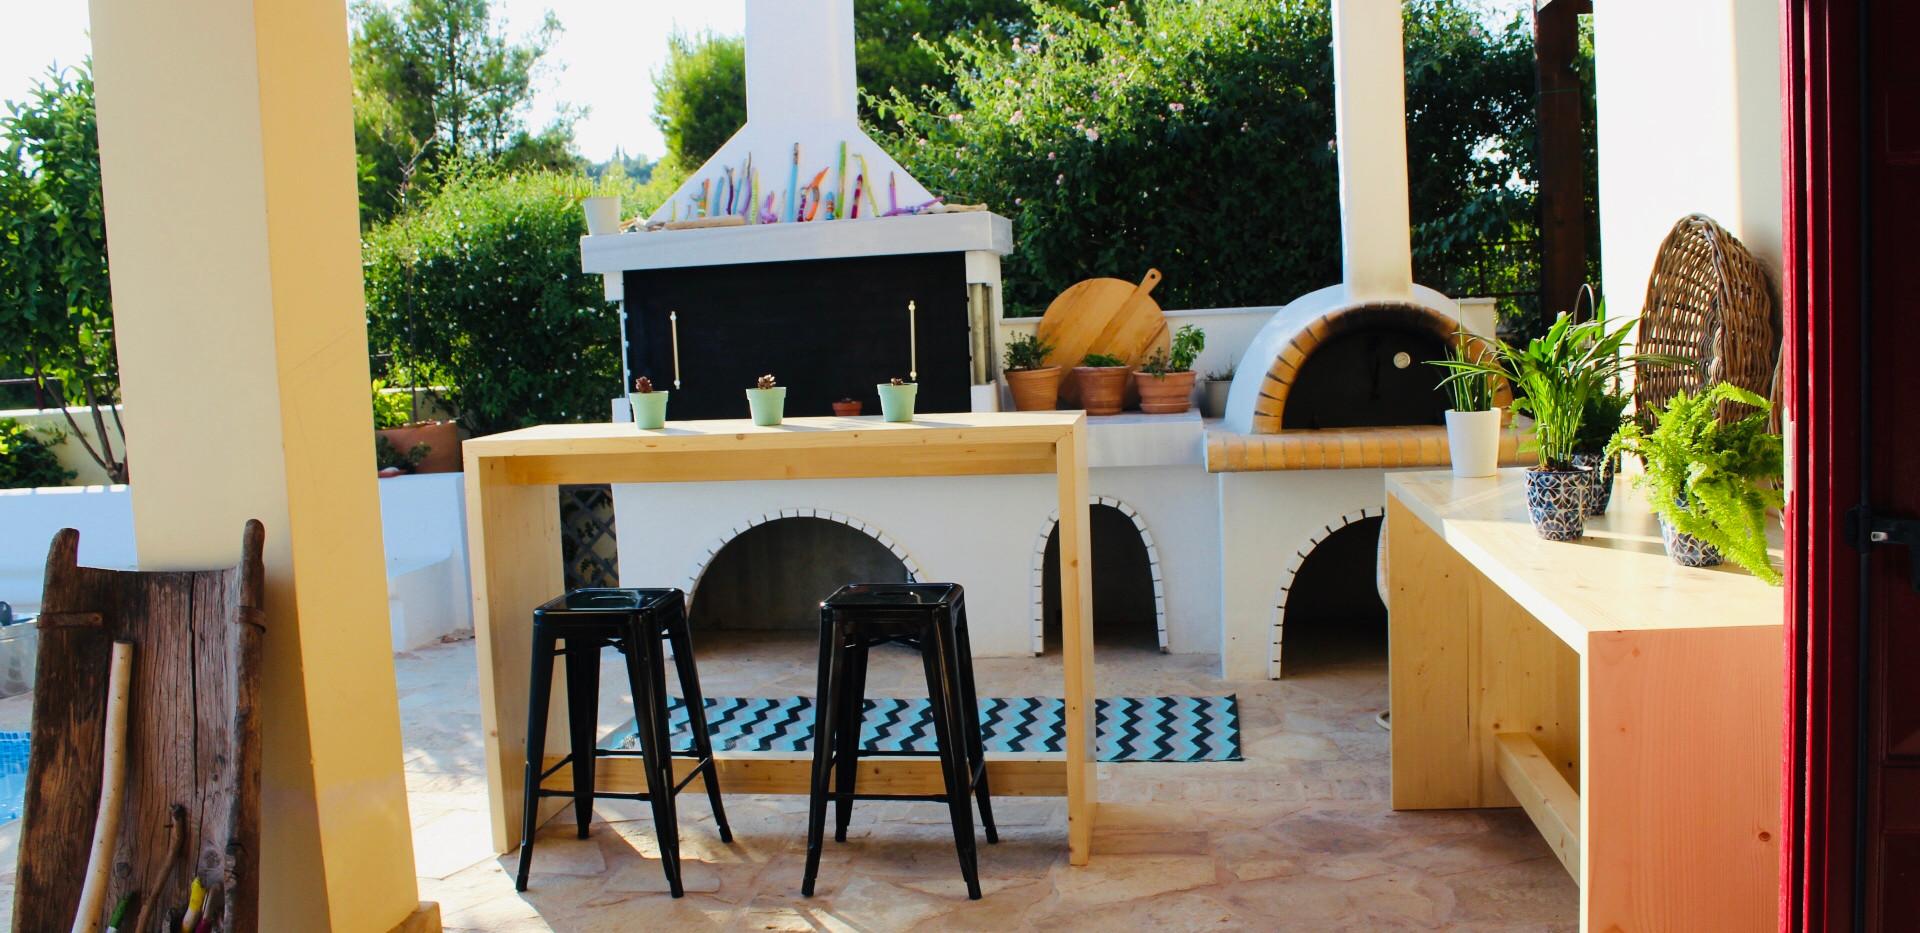 Outdoor kitchen.jpeg